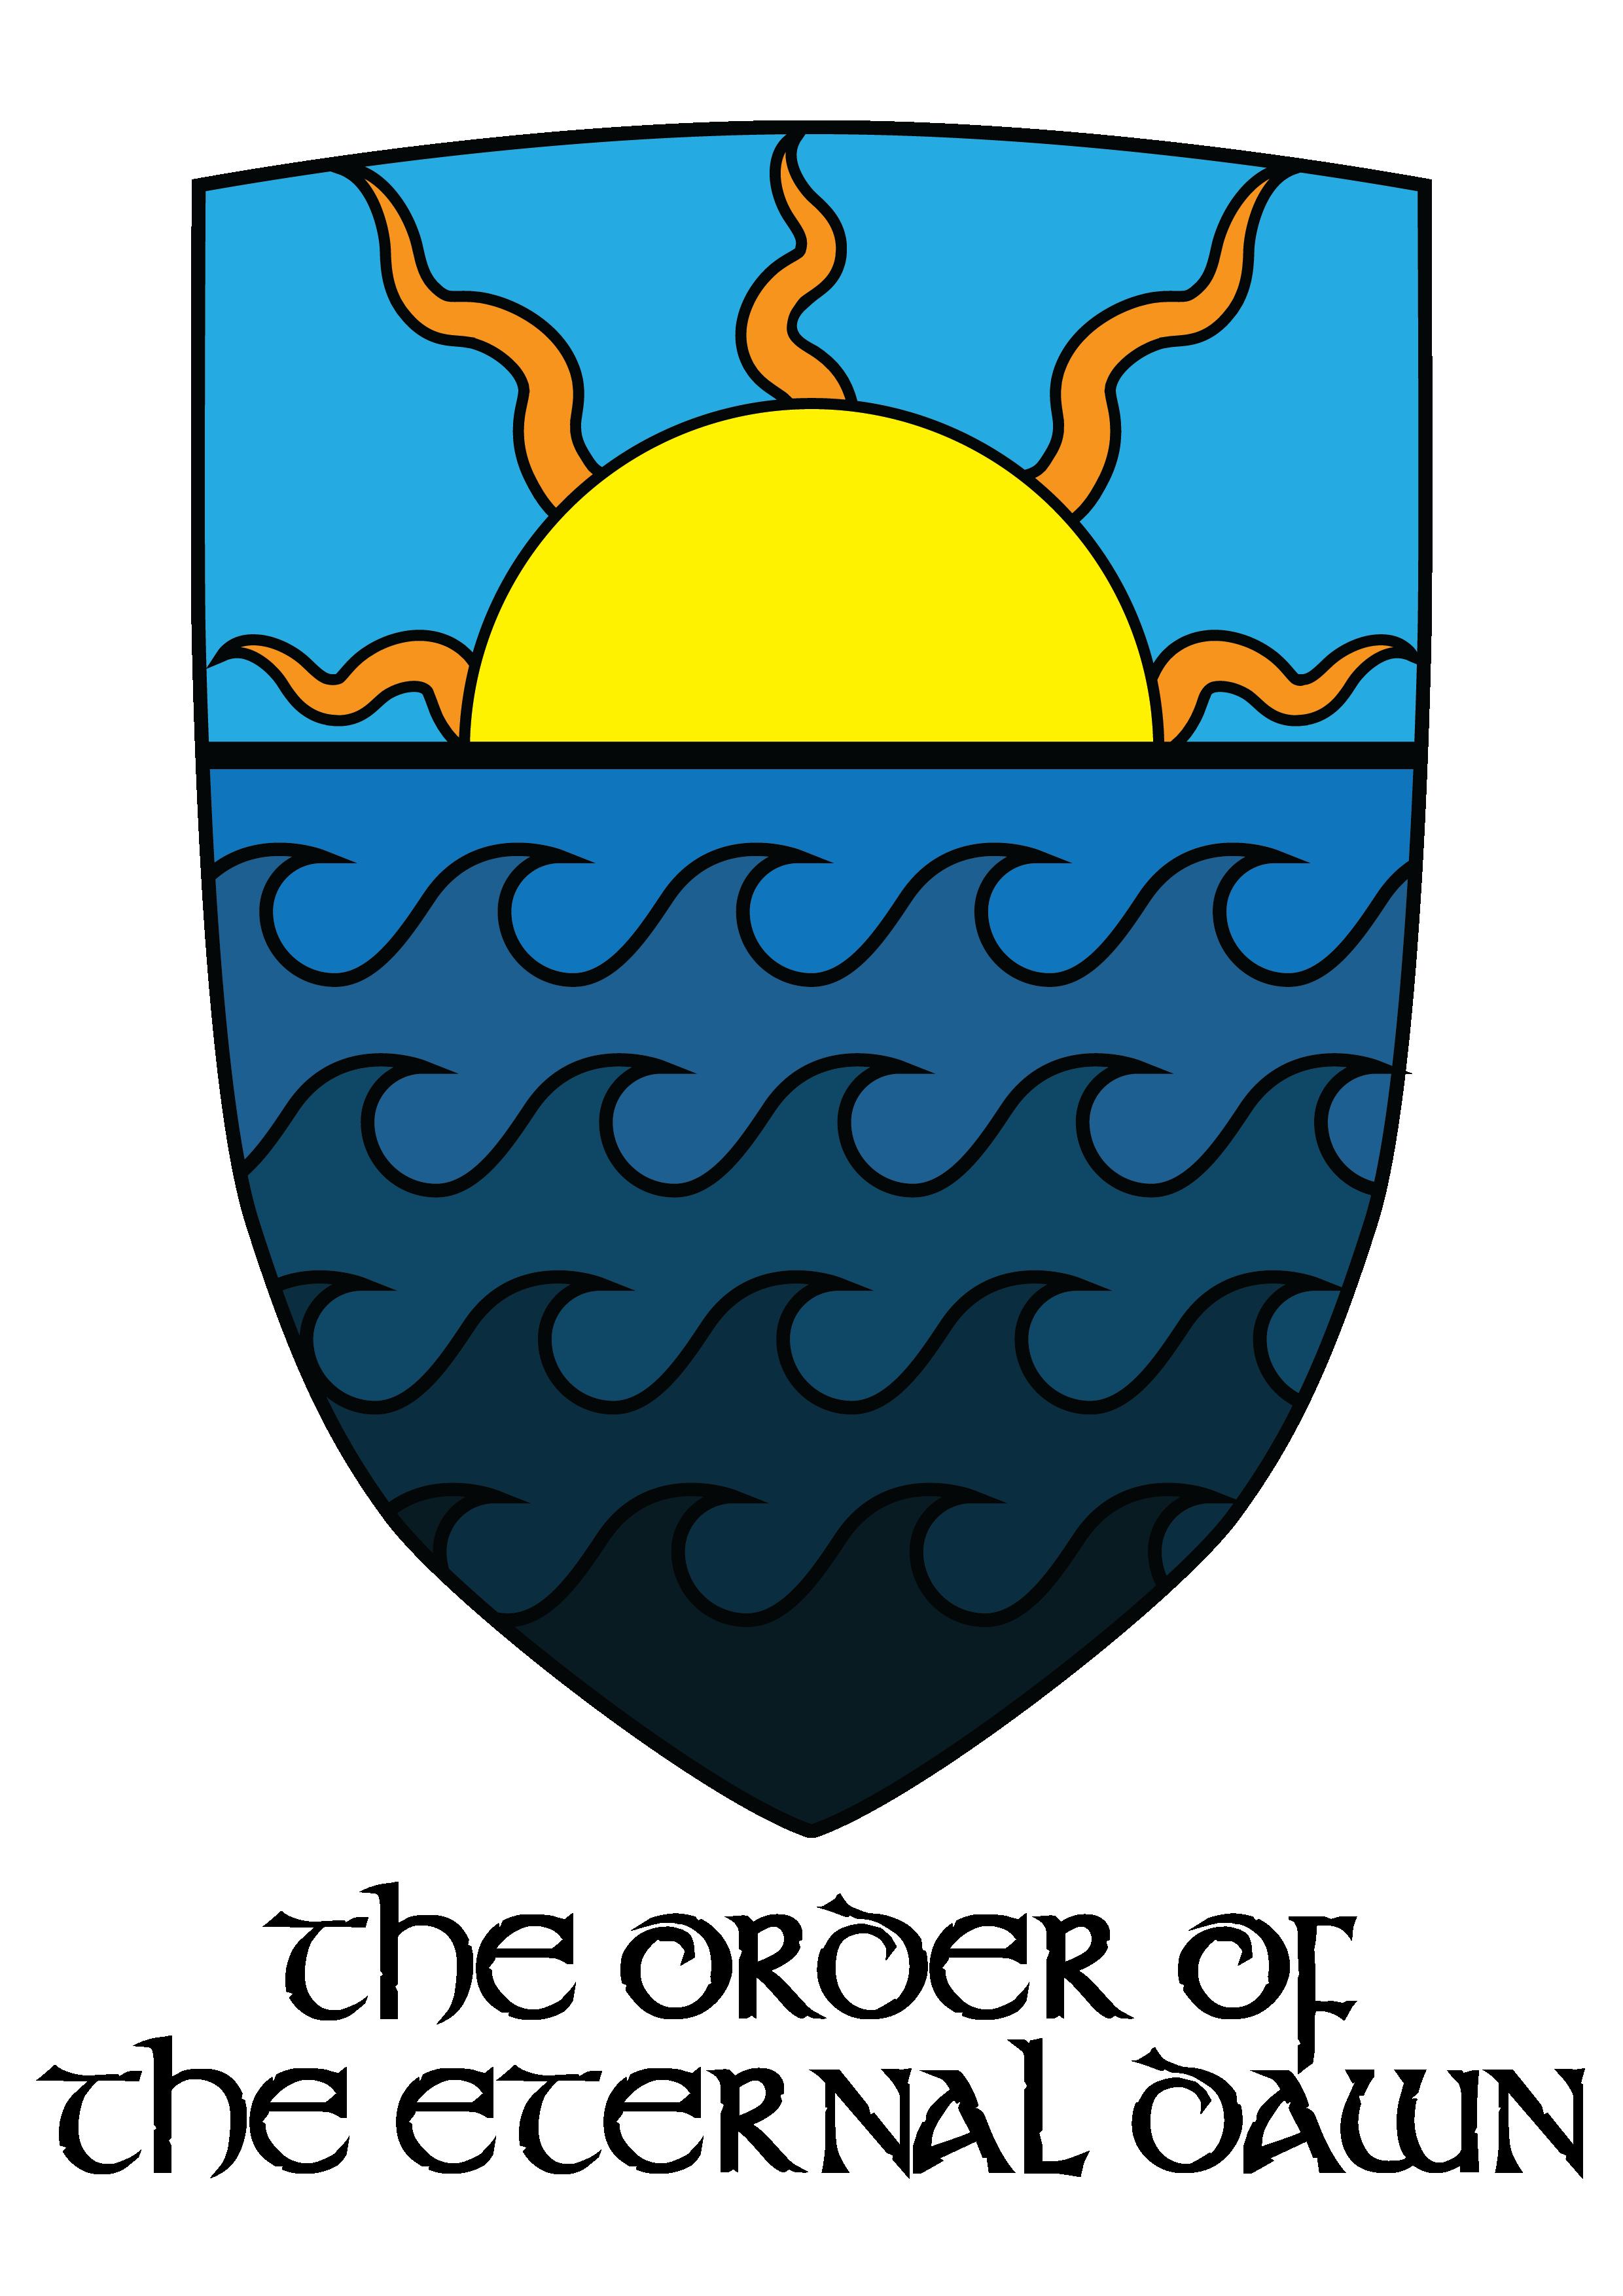 Coat of Arms Design